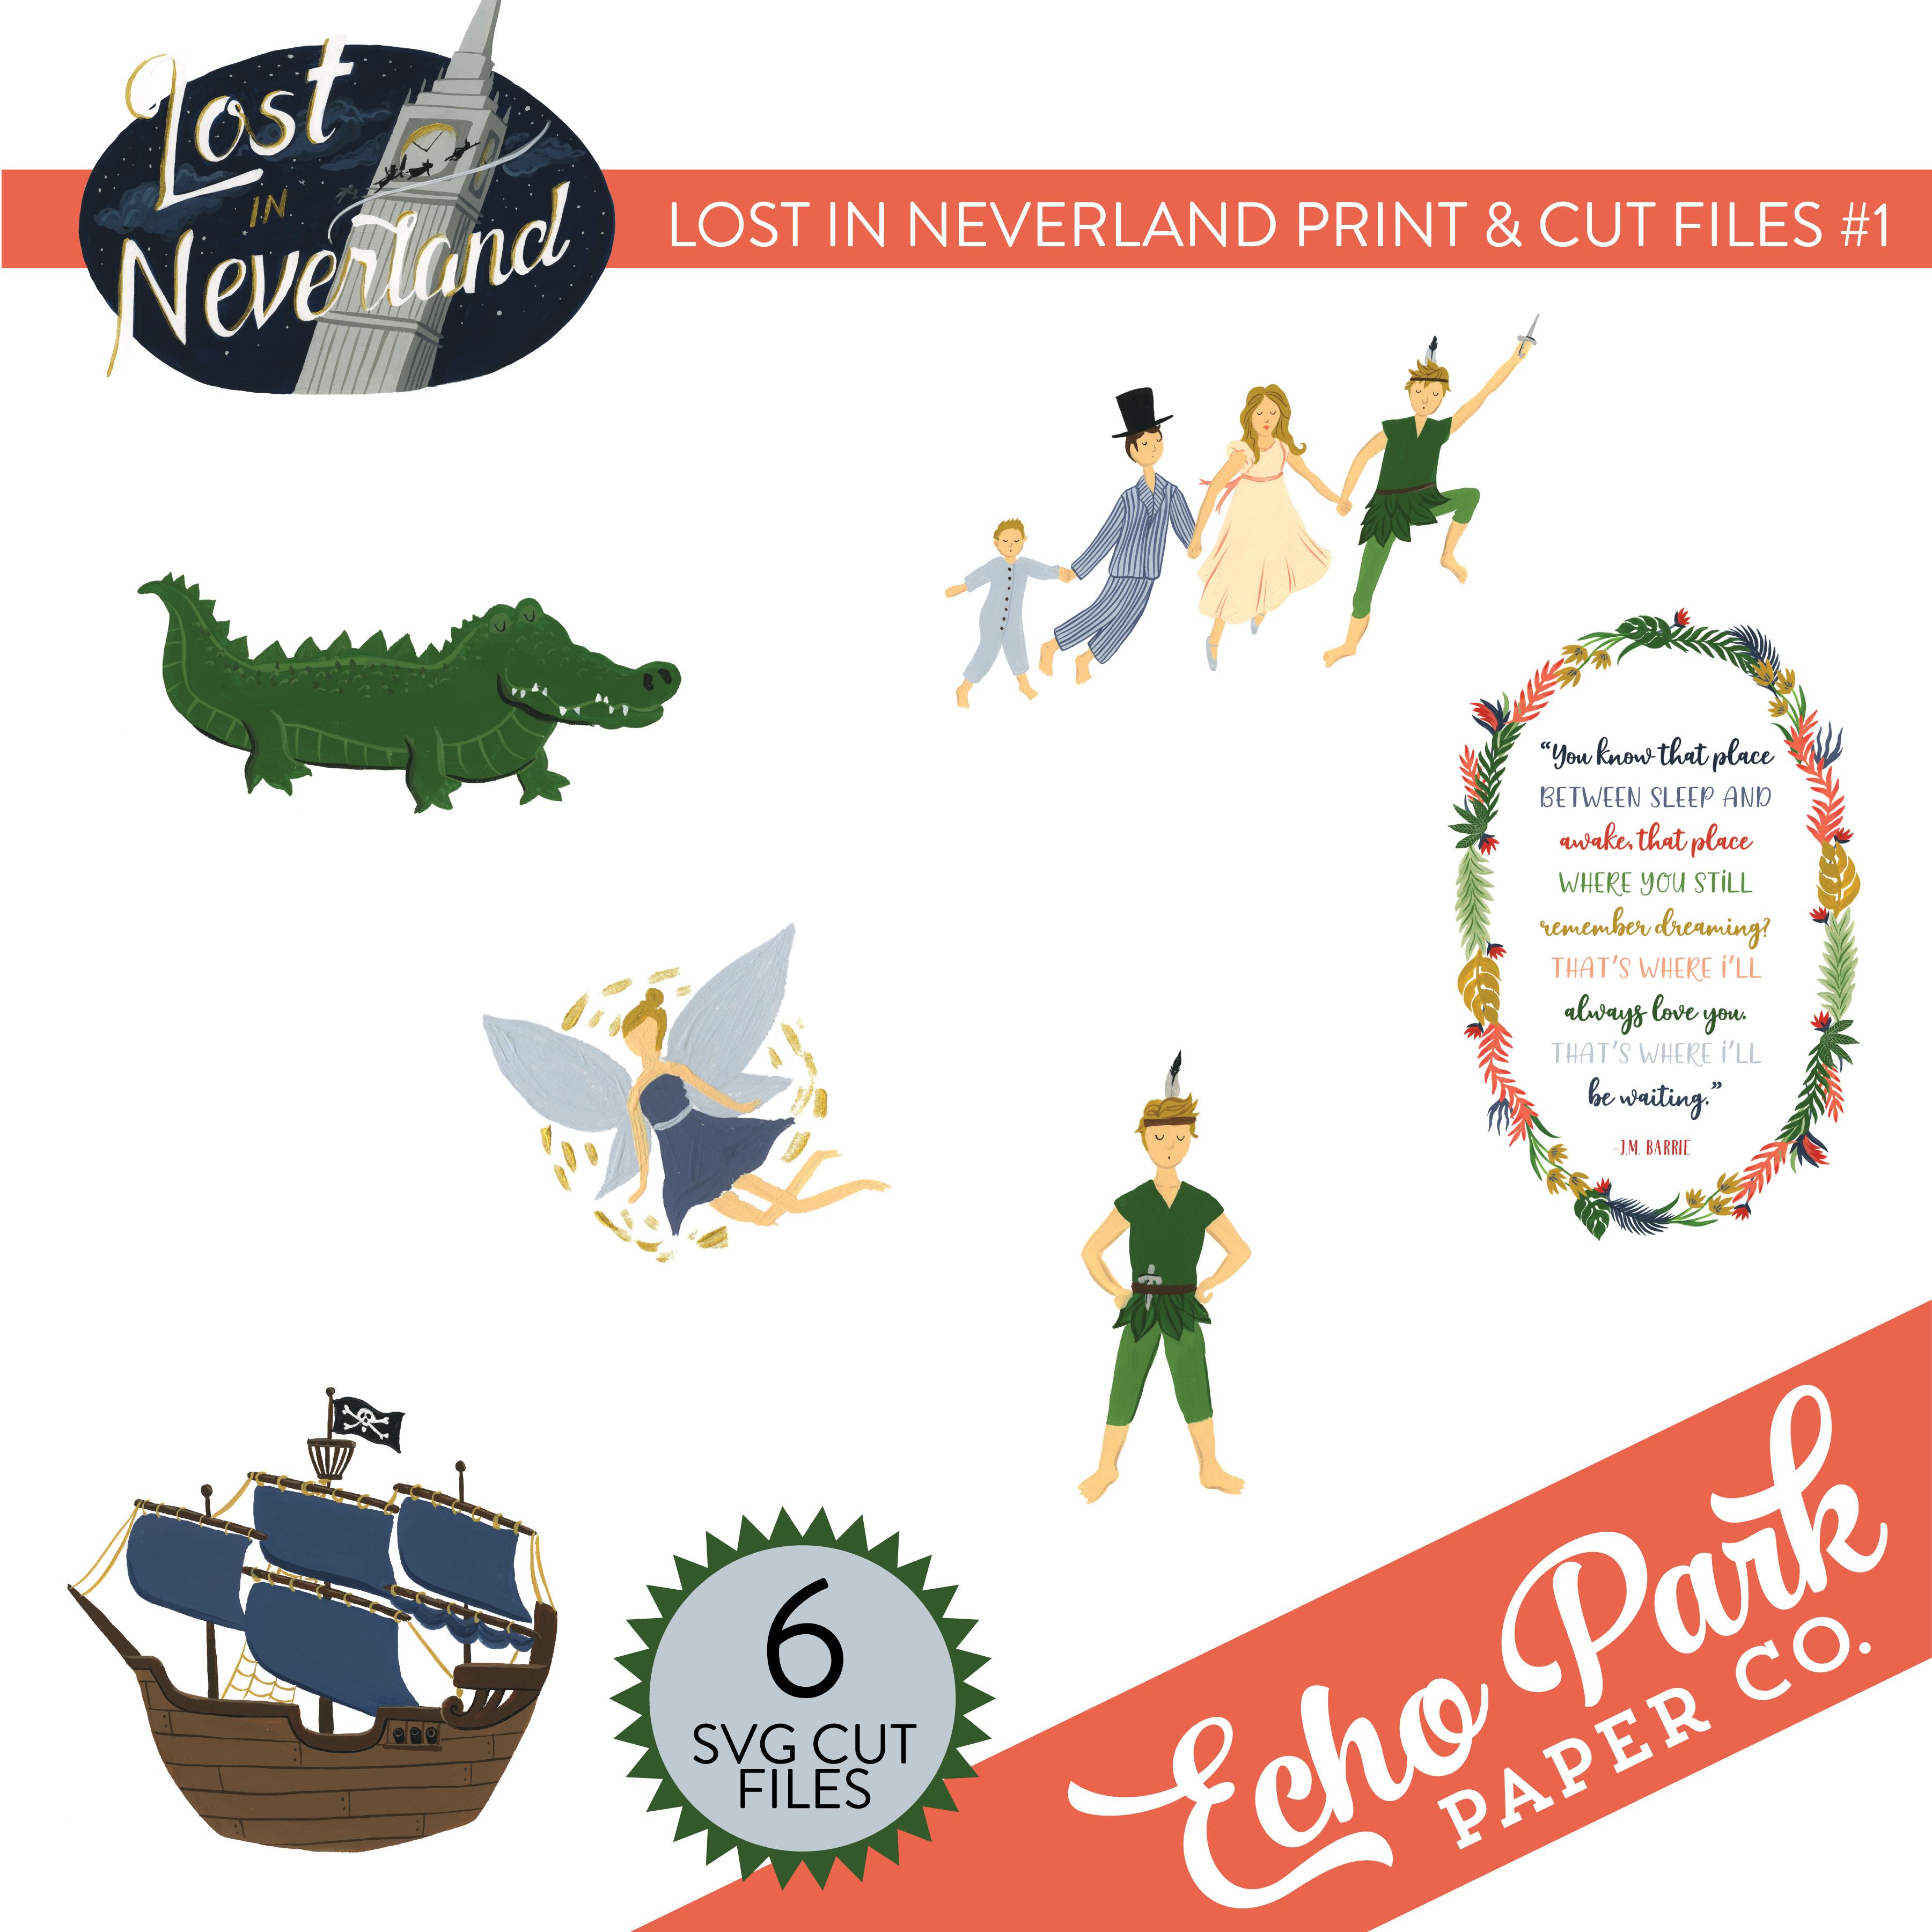 Lost In Neverland Print & Cut Files #1